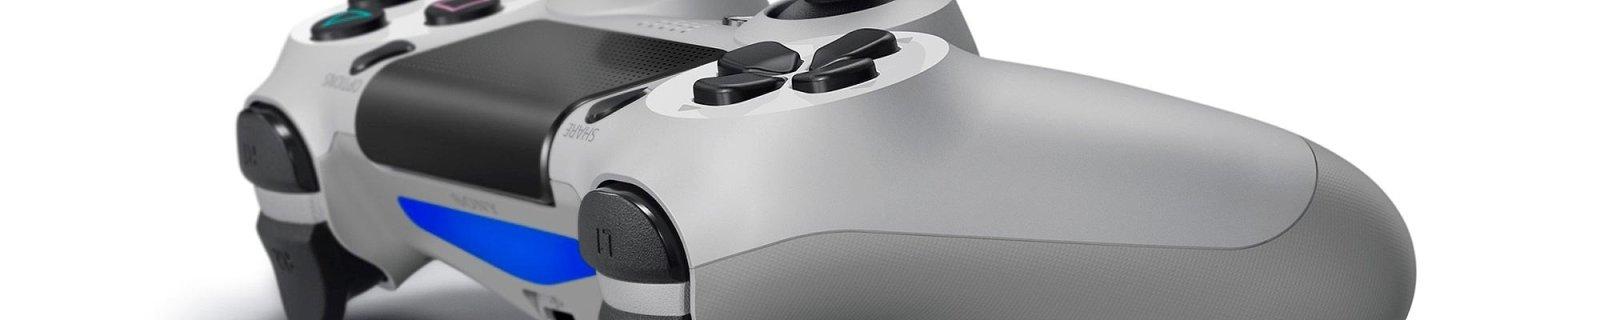 PS4 20周年纪念版行货手柄来了